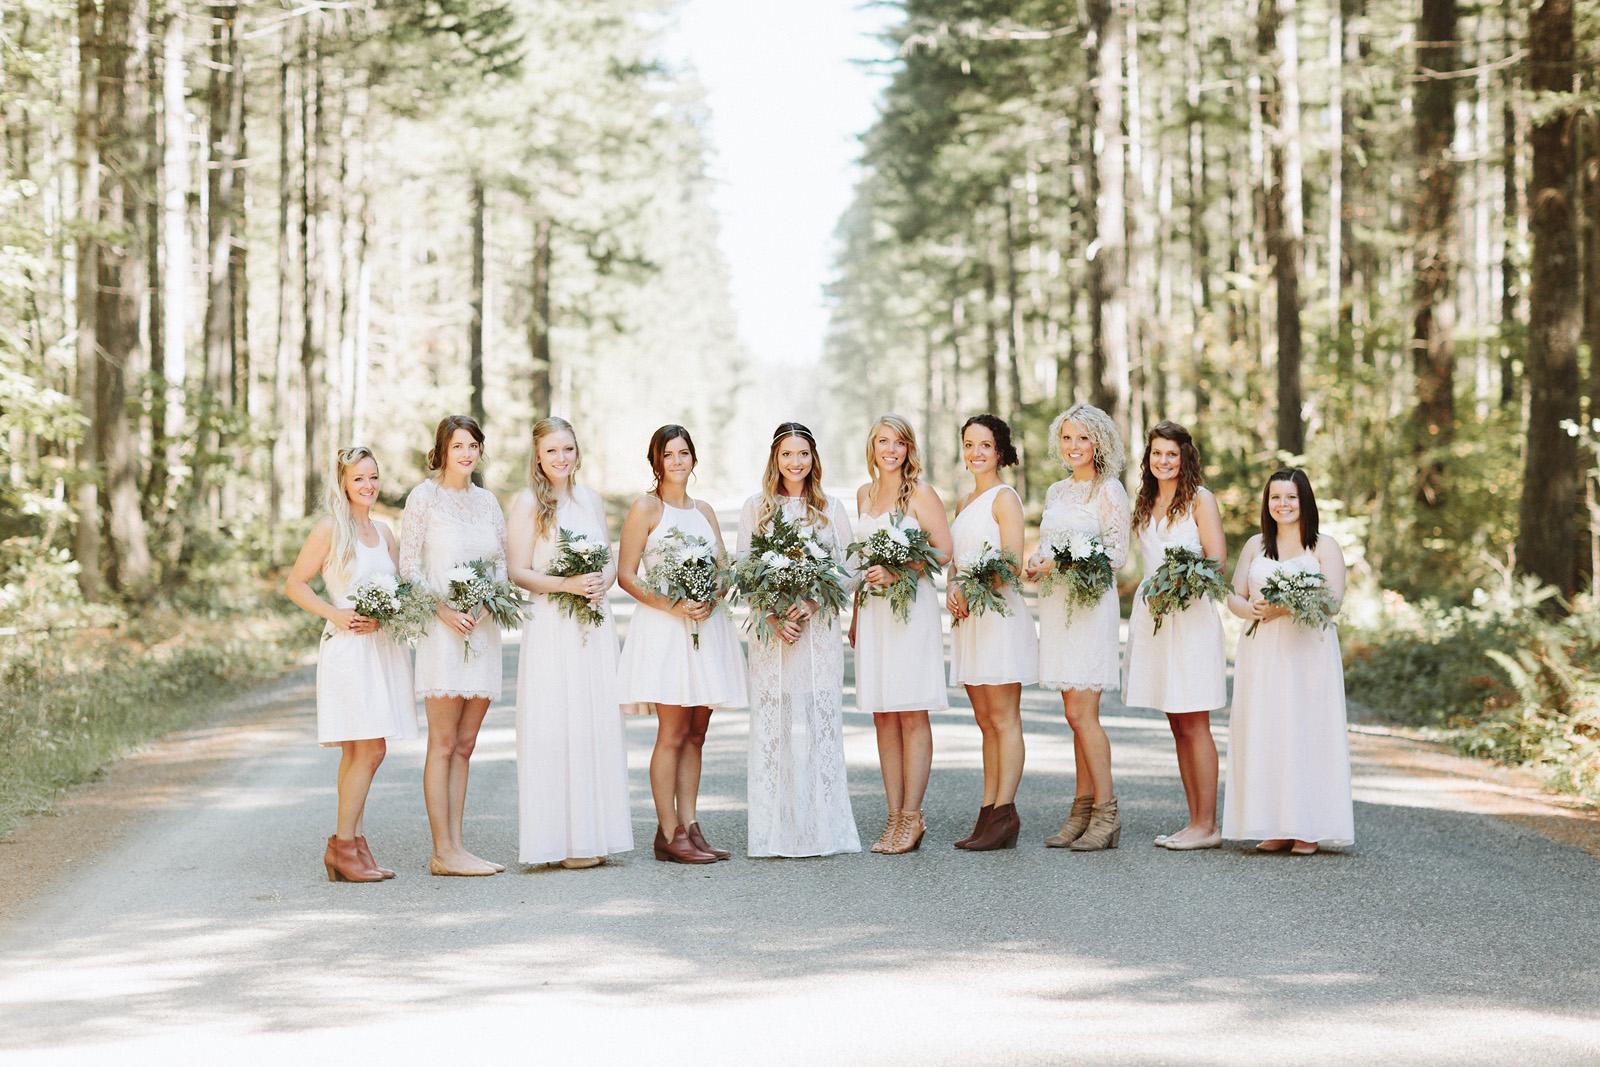 bethany-cory-039 LAKE CUSHMAN CAMPING WEDDING